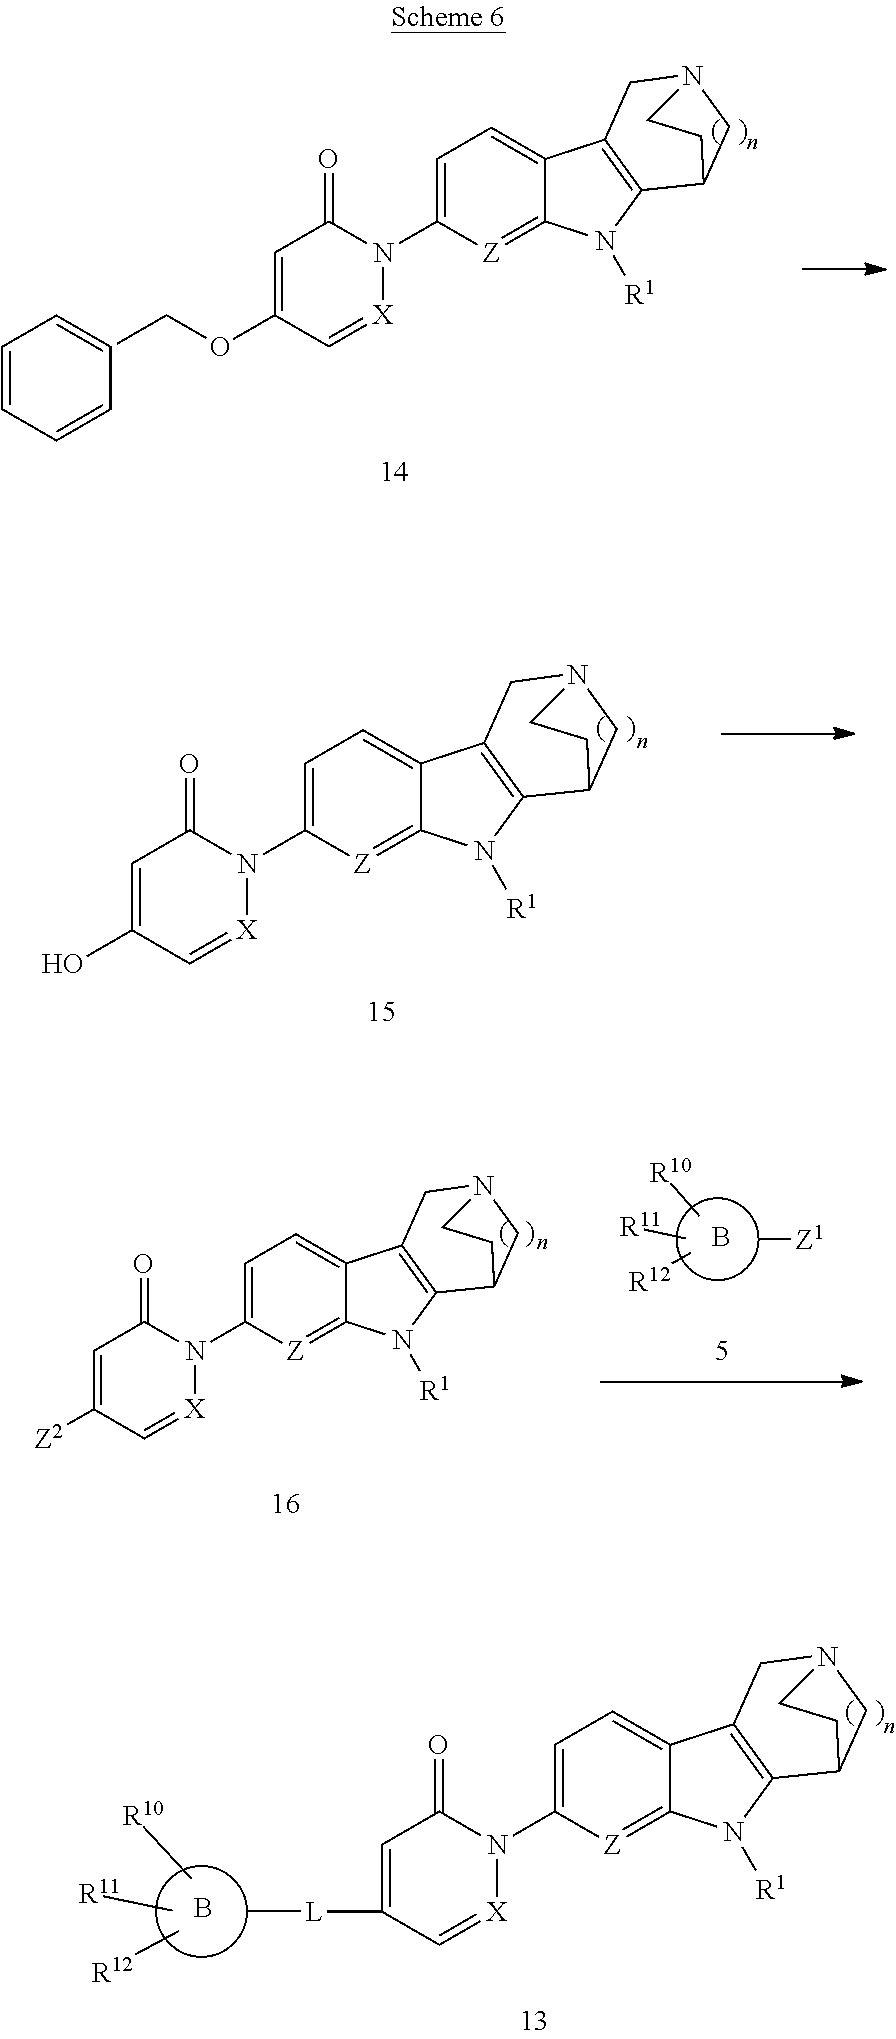 us9073925b2 azinone substituted azabicycloalkane indole and Ortho Tech Salary figure us09073925 20150707 c00022